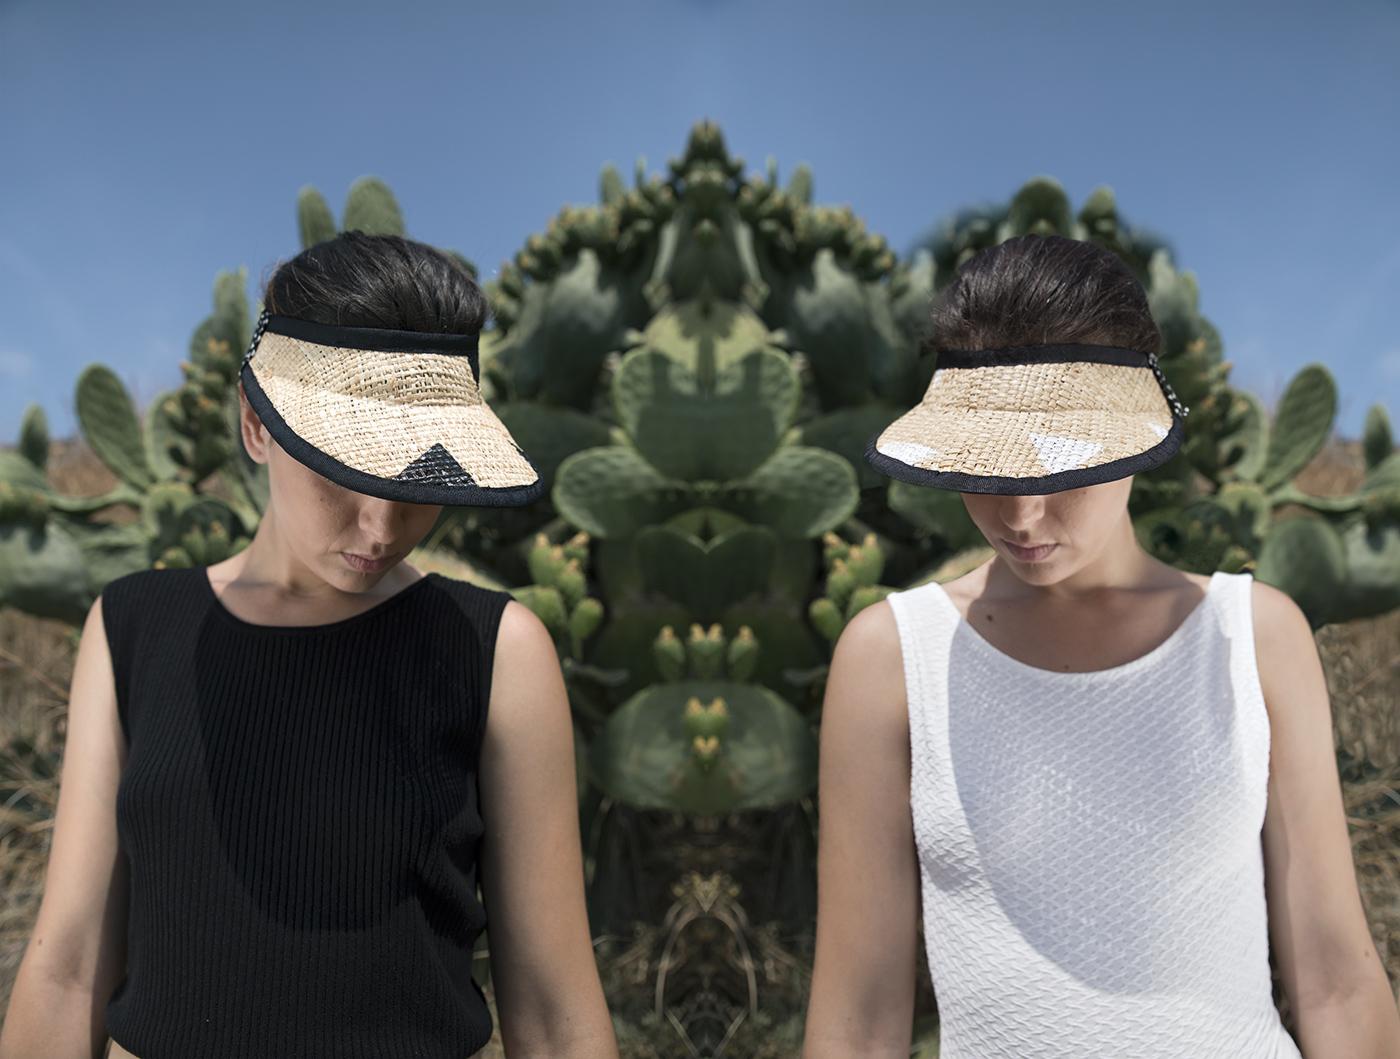 Andrea-Vientec - Duoh - De Ubieta Geminis